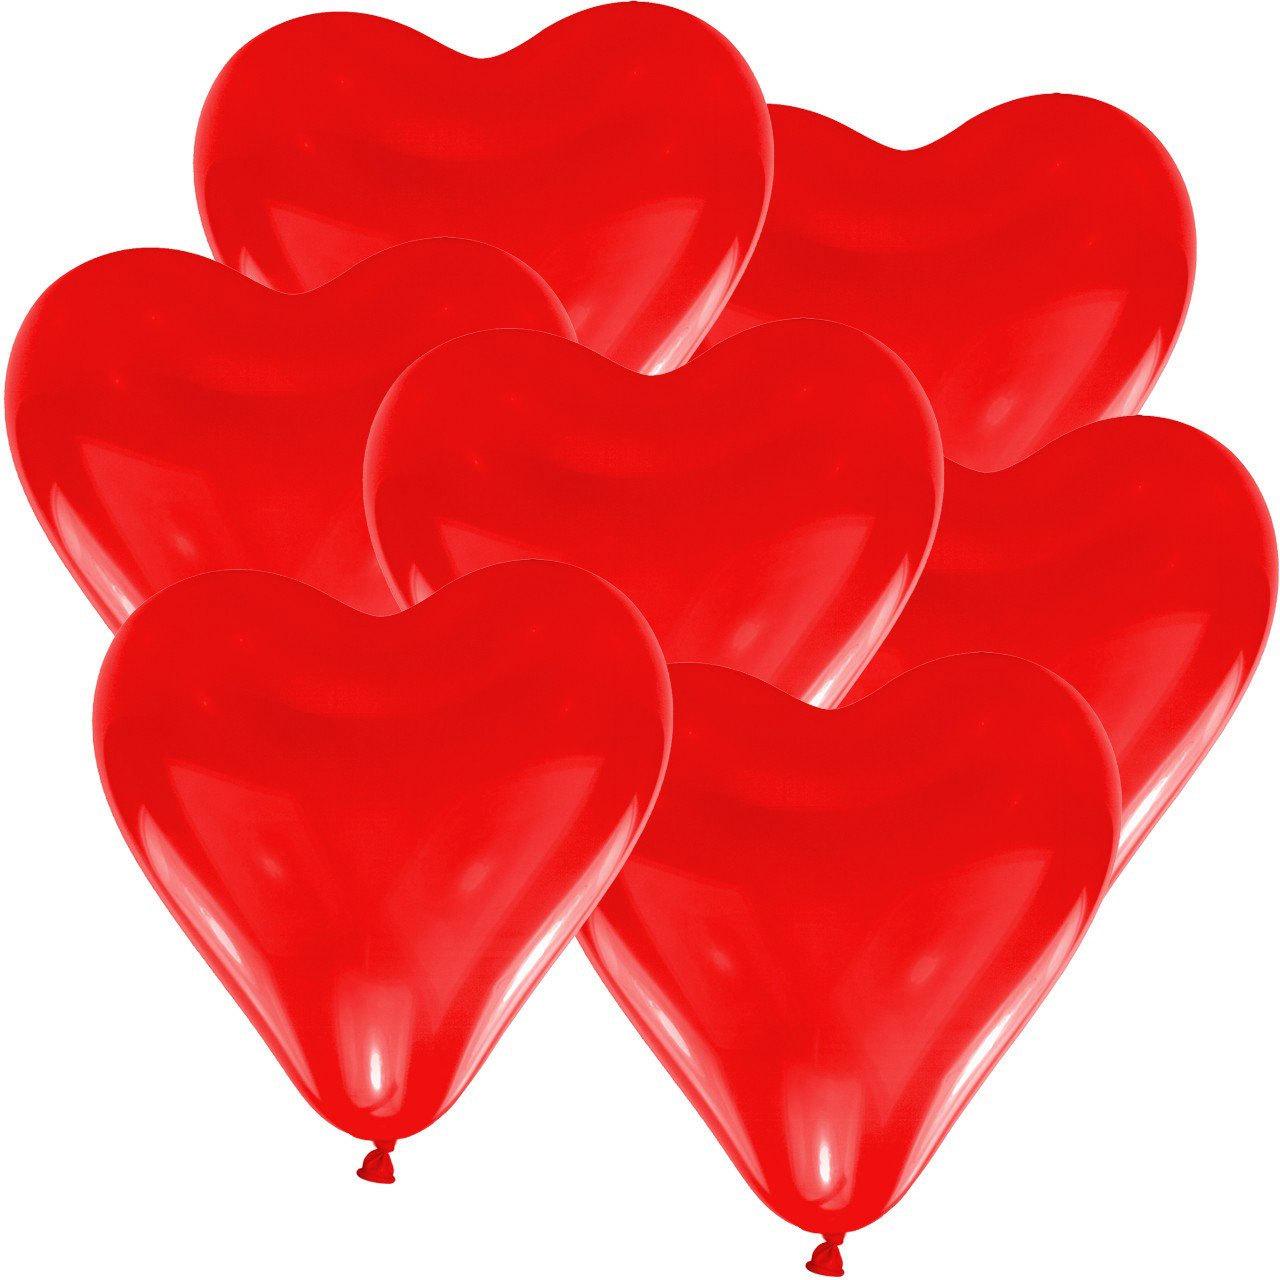 100 große Herzluftballons Herzballons Herzluftballon Luftballons Herz Luftballon